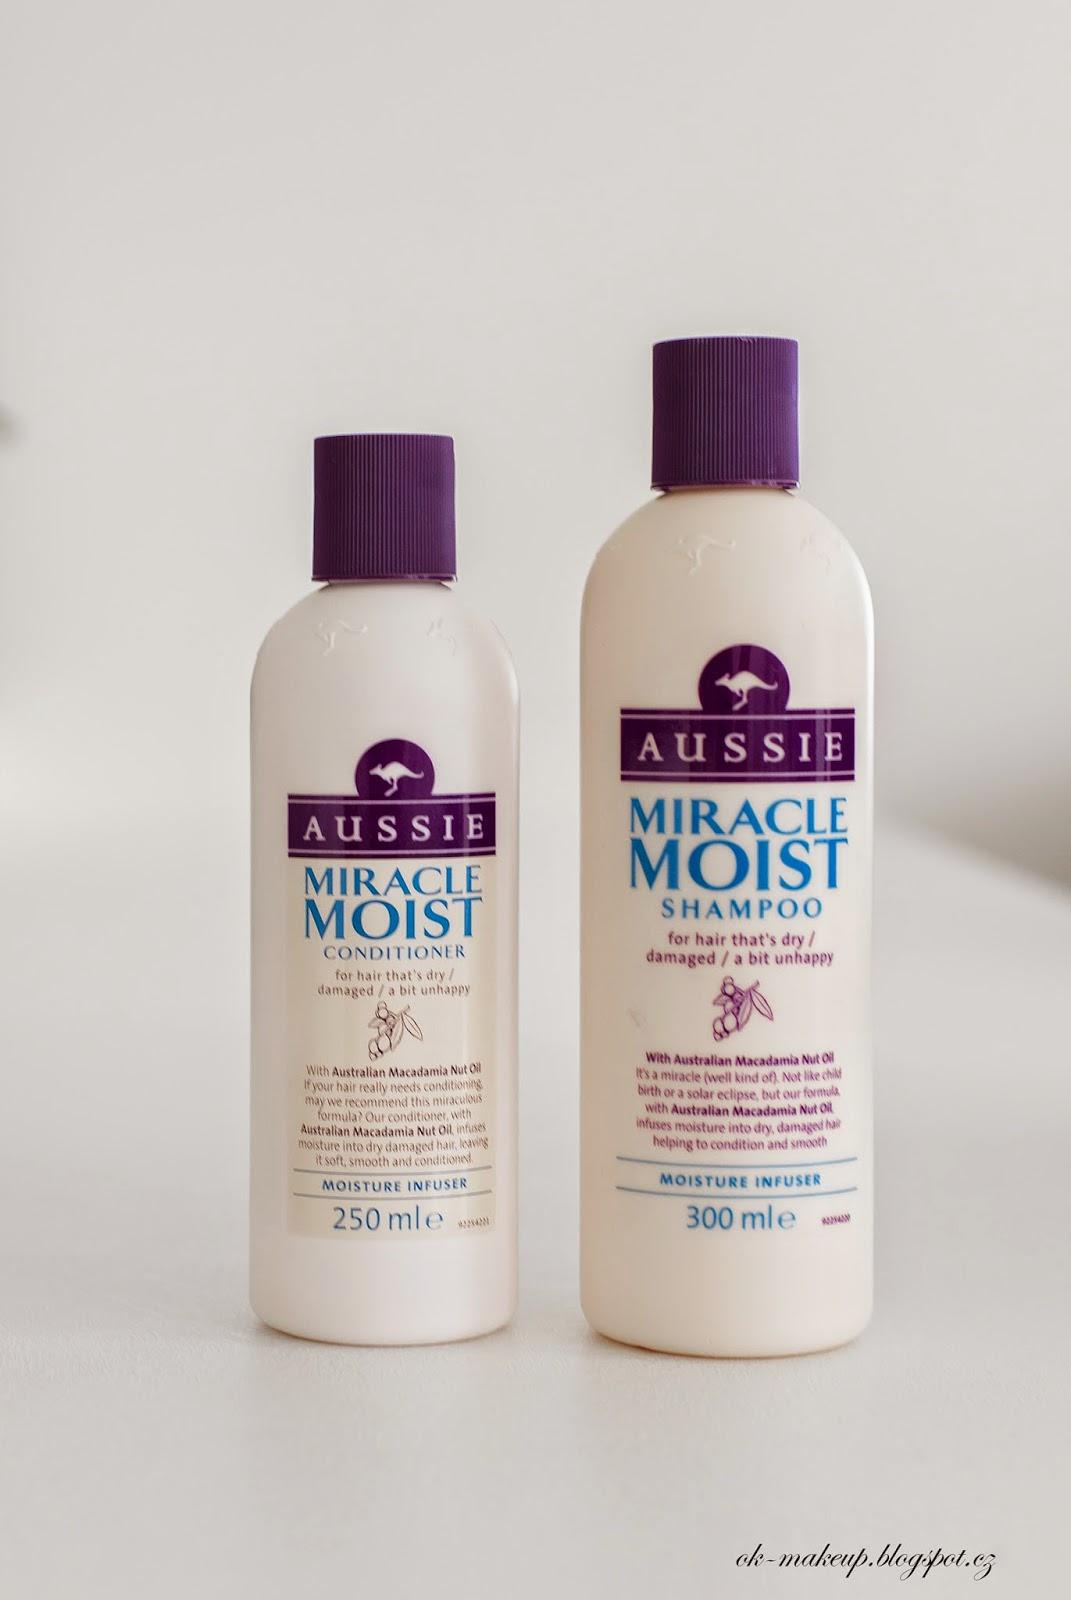 aussie, miracle moist, shampoo, conditioner, hair